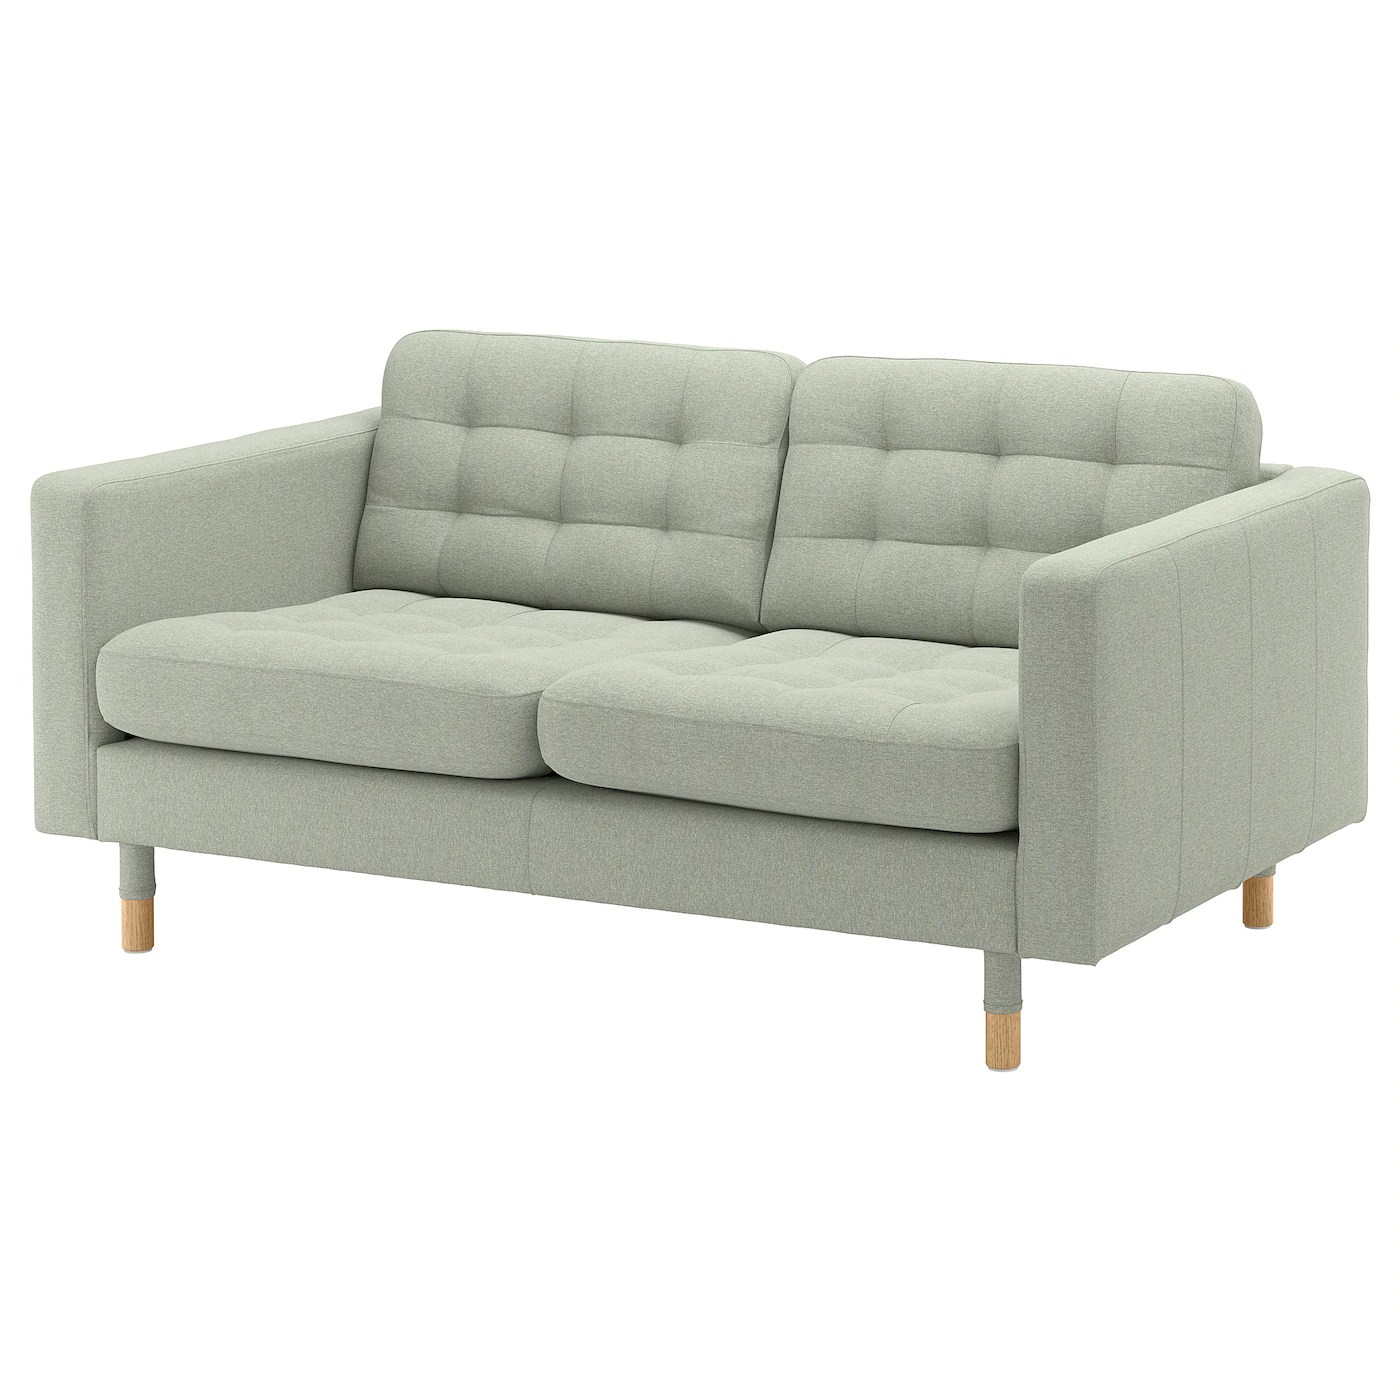 sofa 10 year guarantee cb2 cielo small and 2 seater ikea